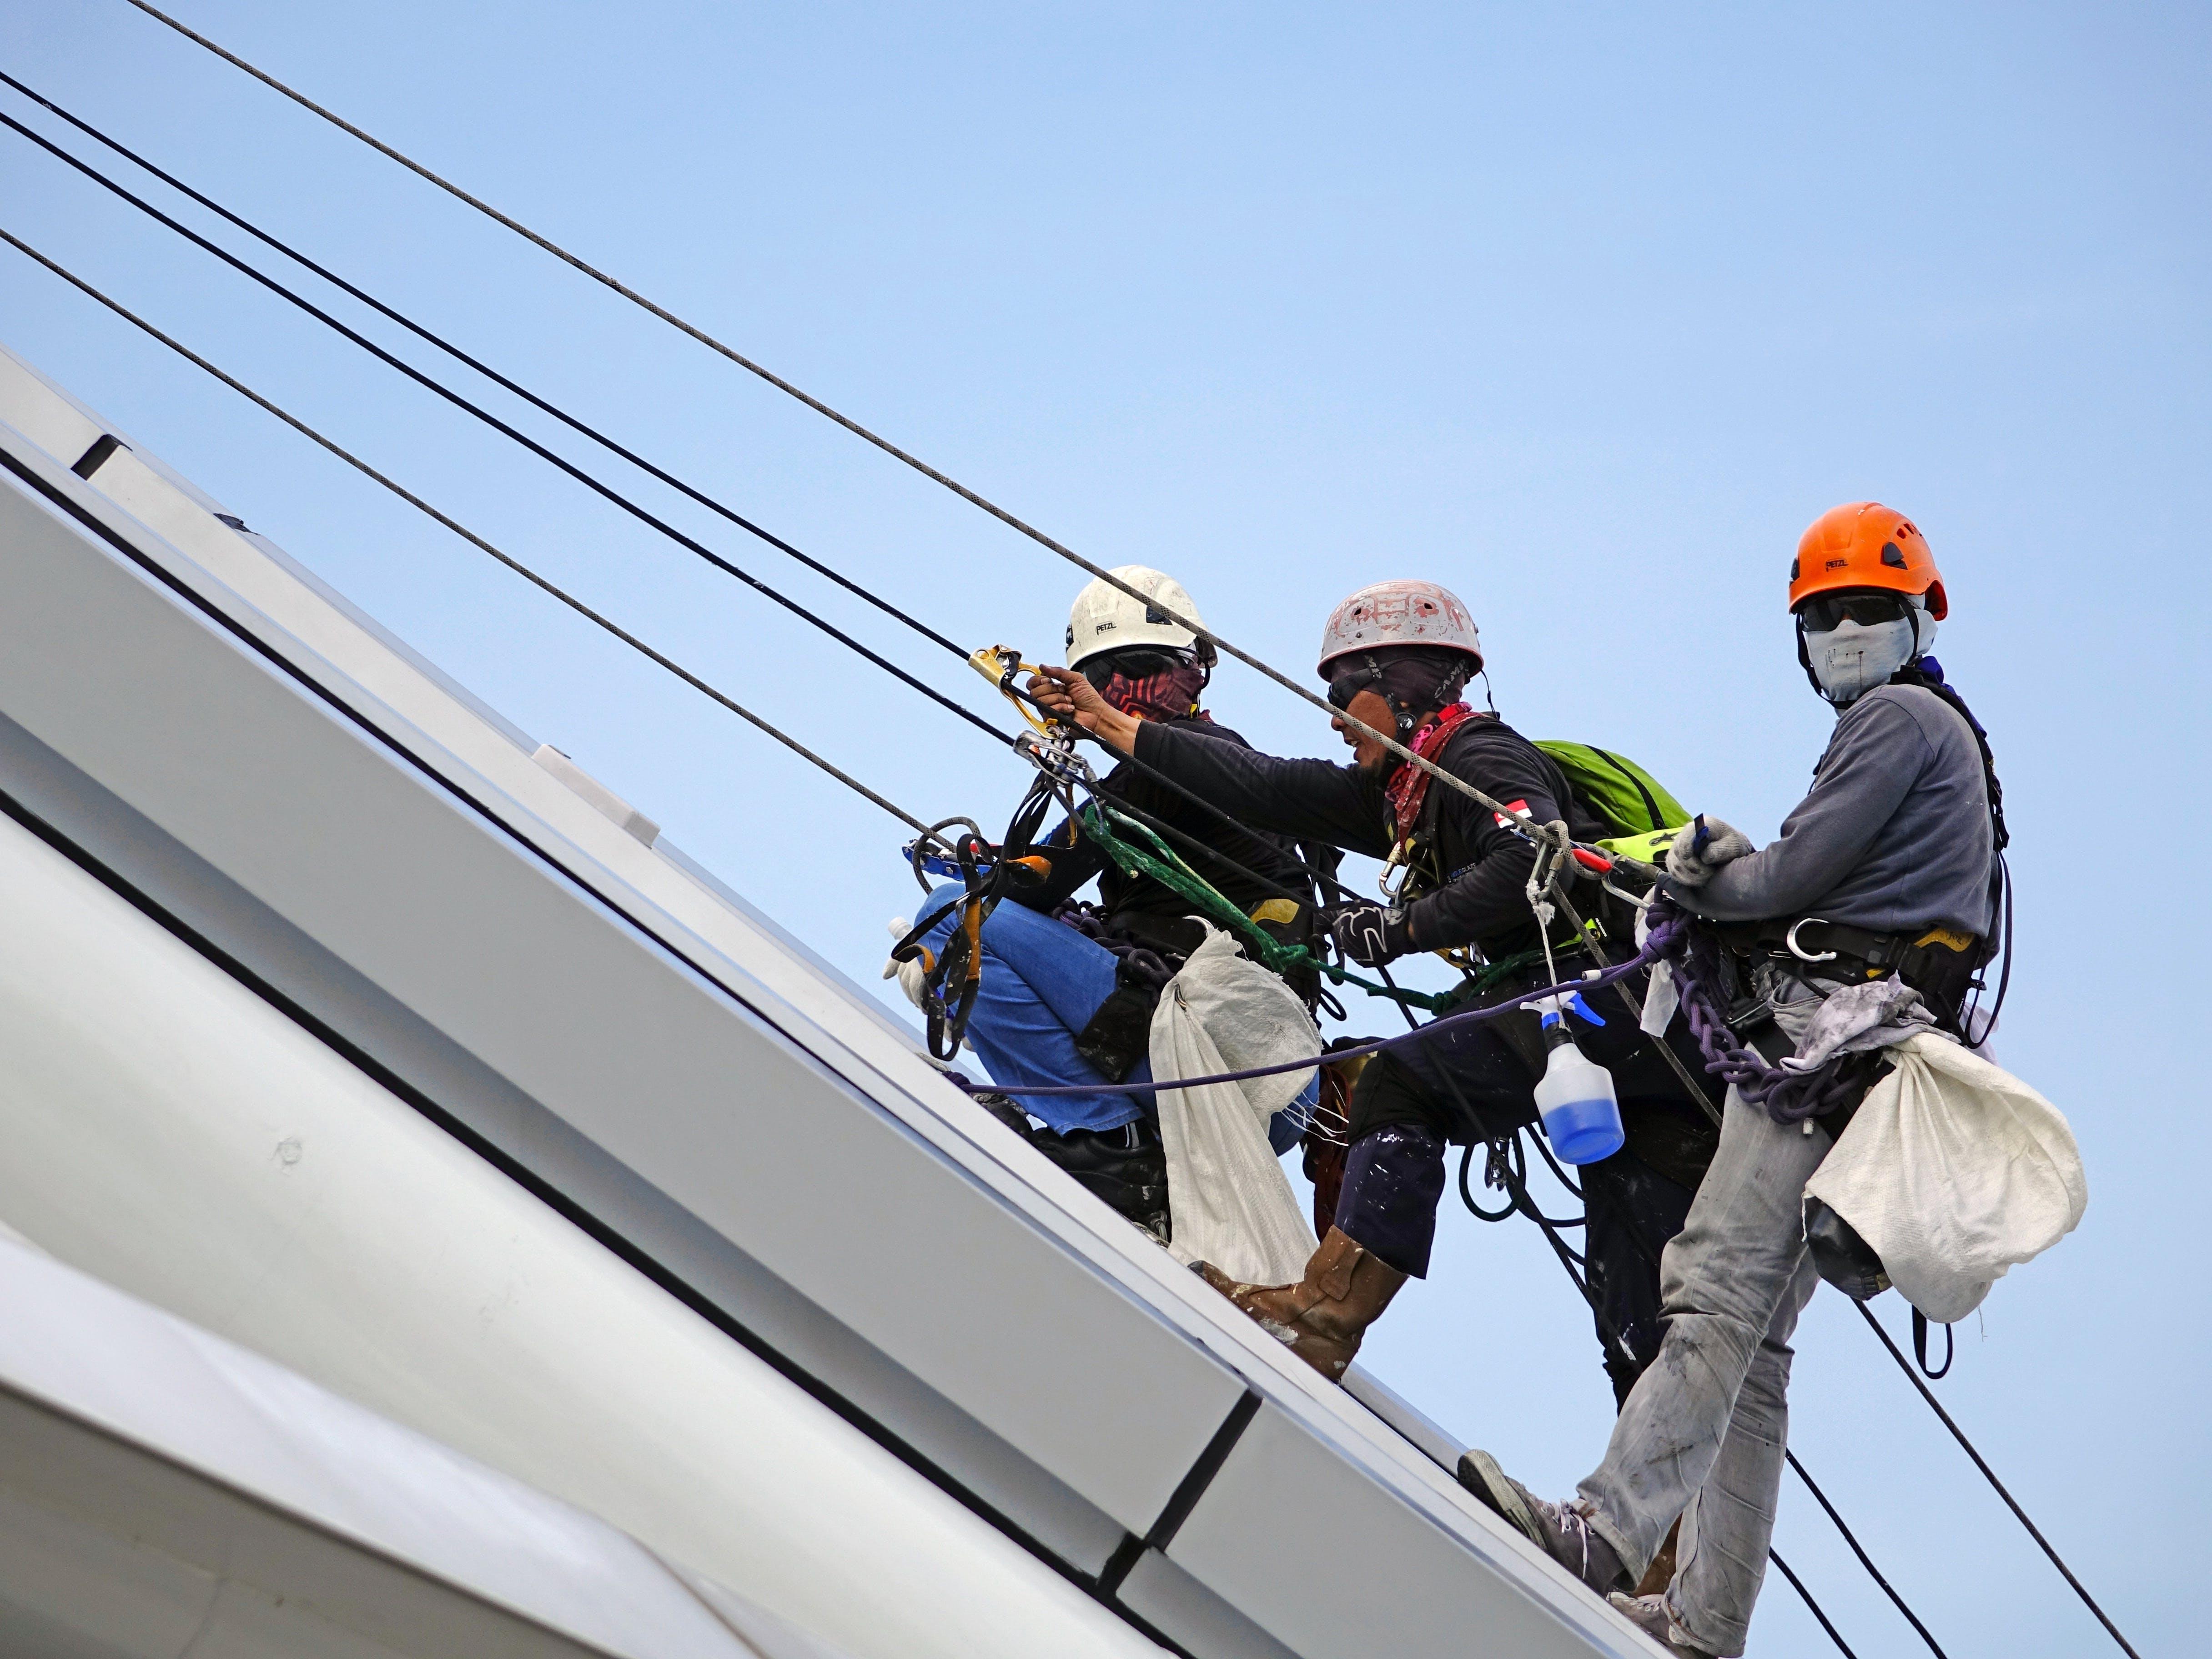 Three Men Climbing on Wall Using Rope